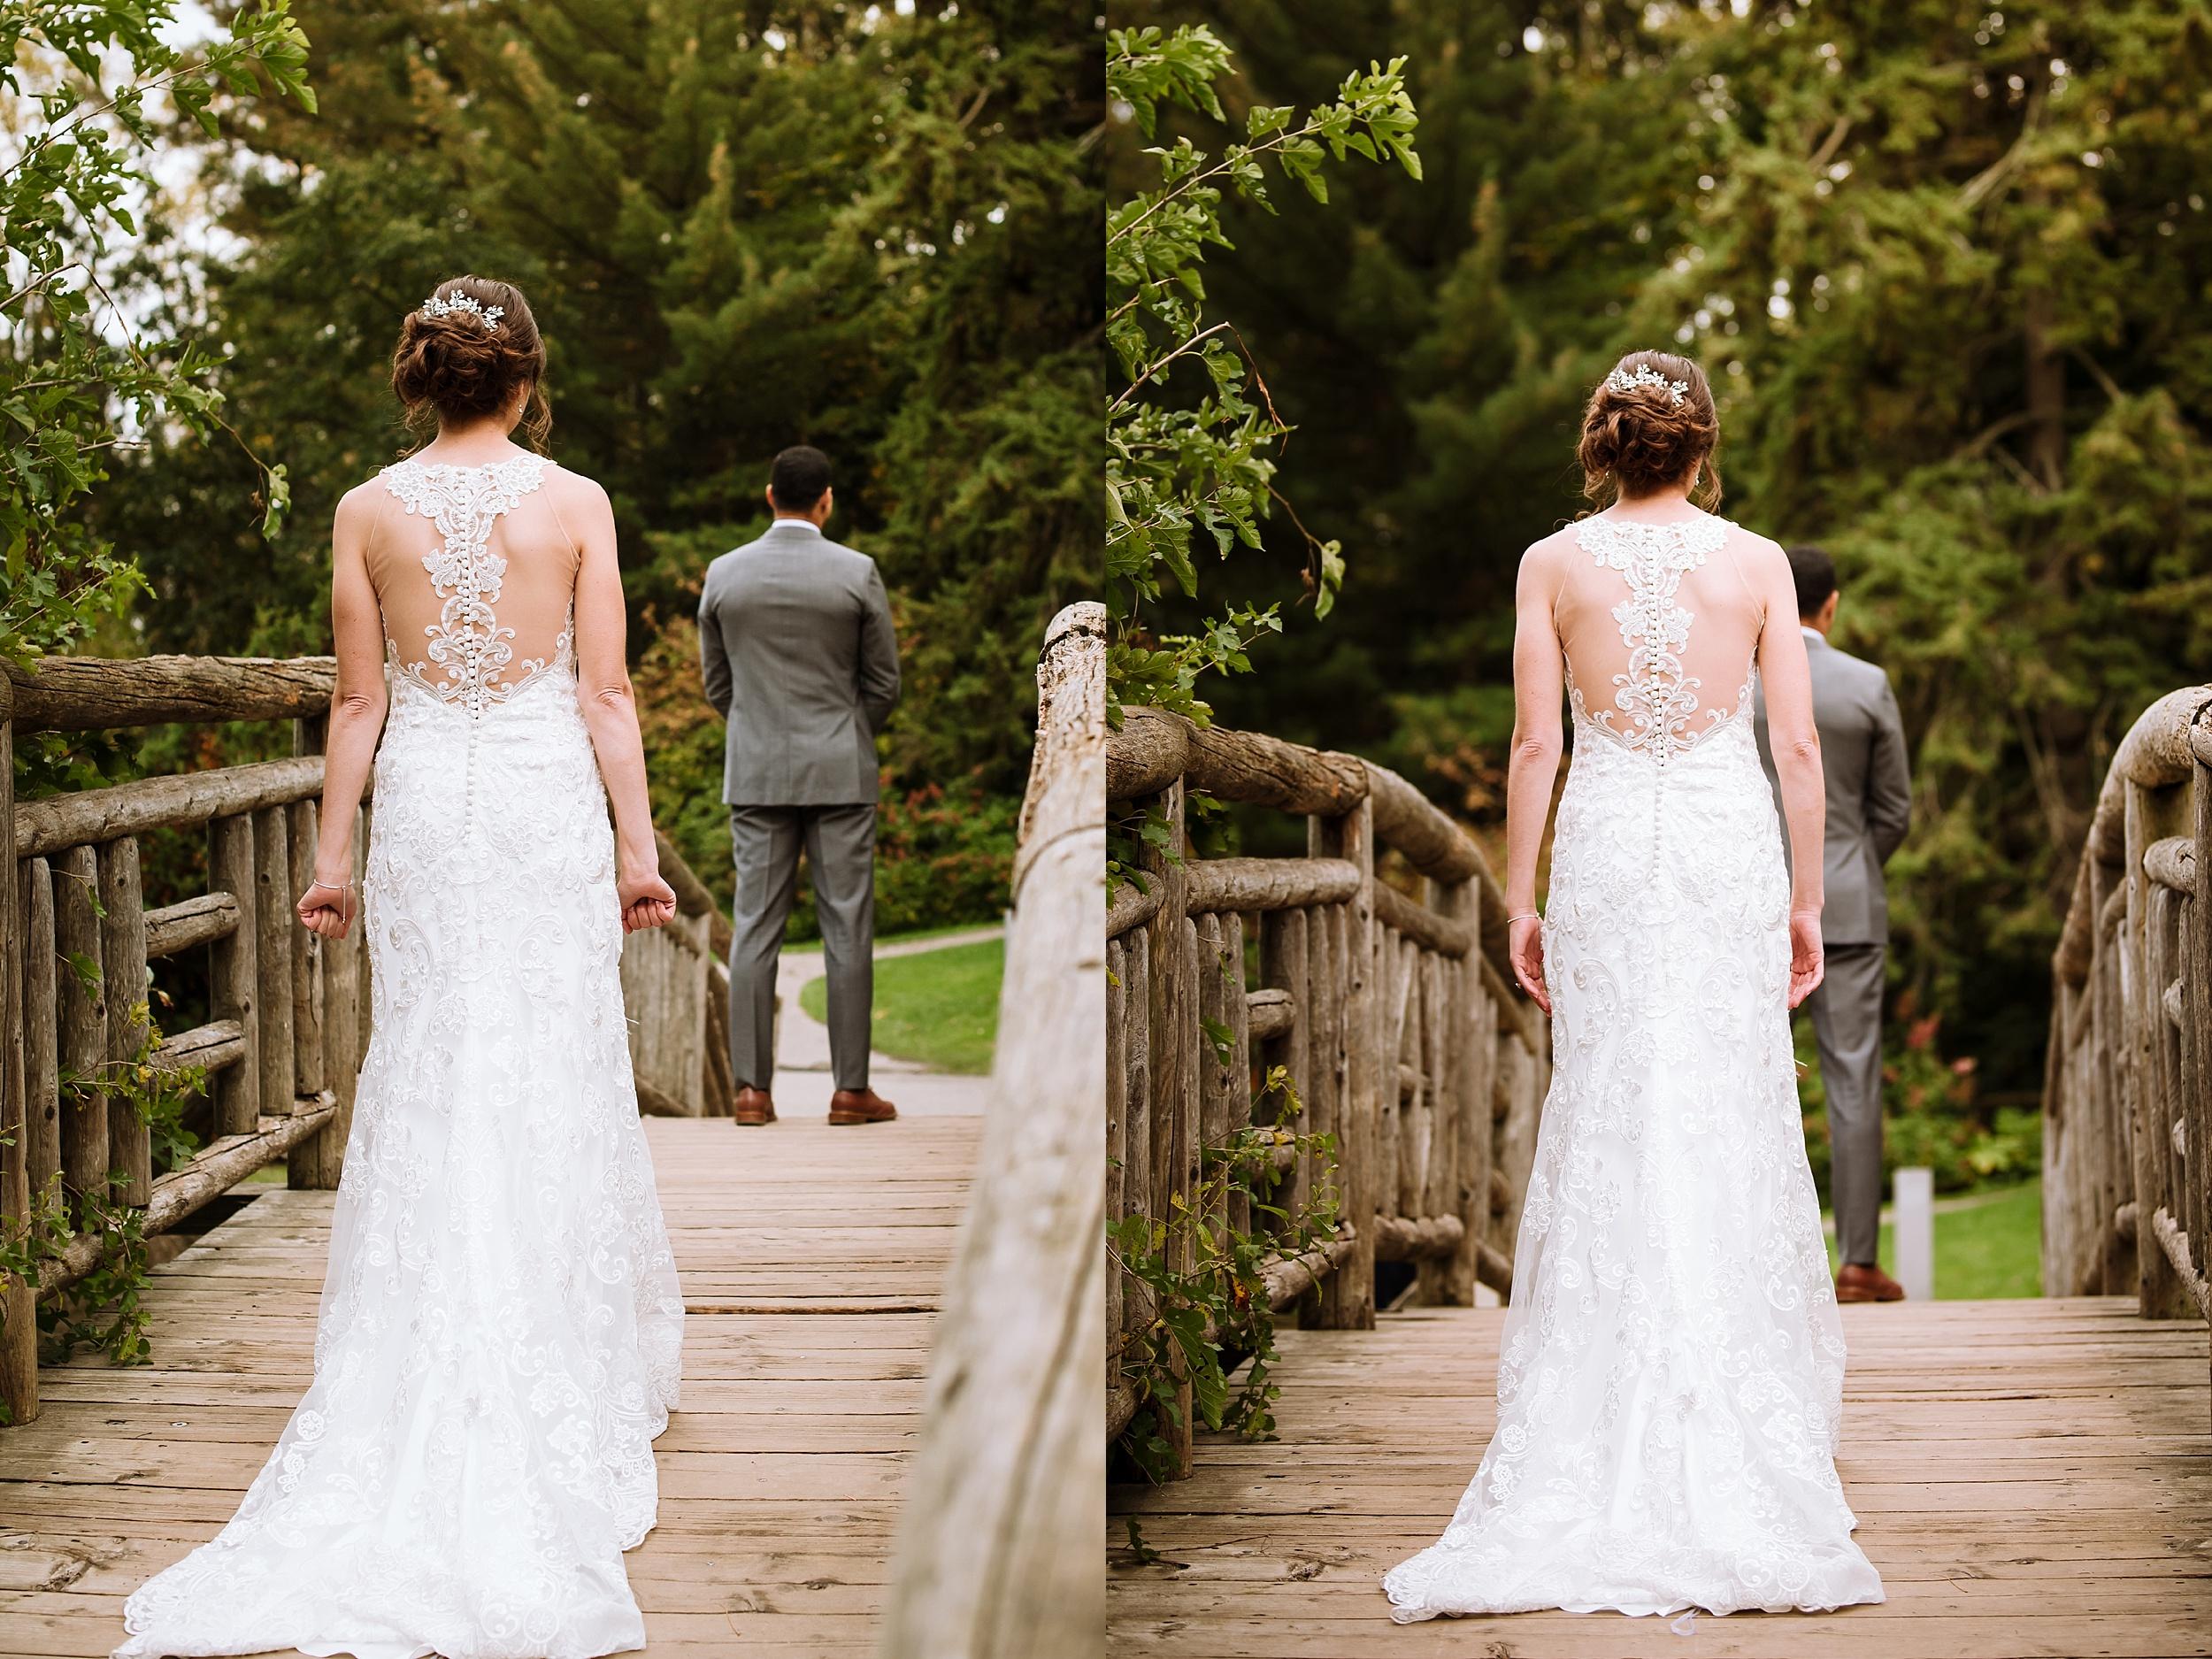 Toronto_Wedding_Photographer_Edwards_Gardens_0022.jpg